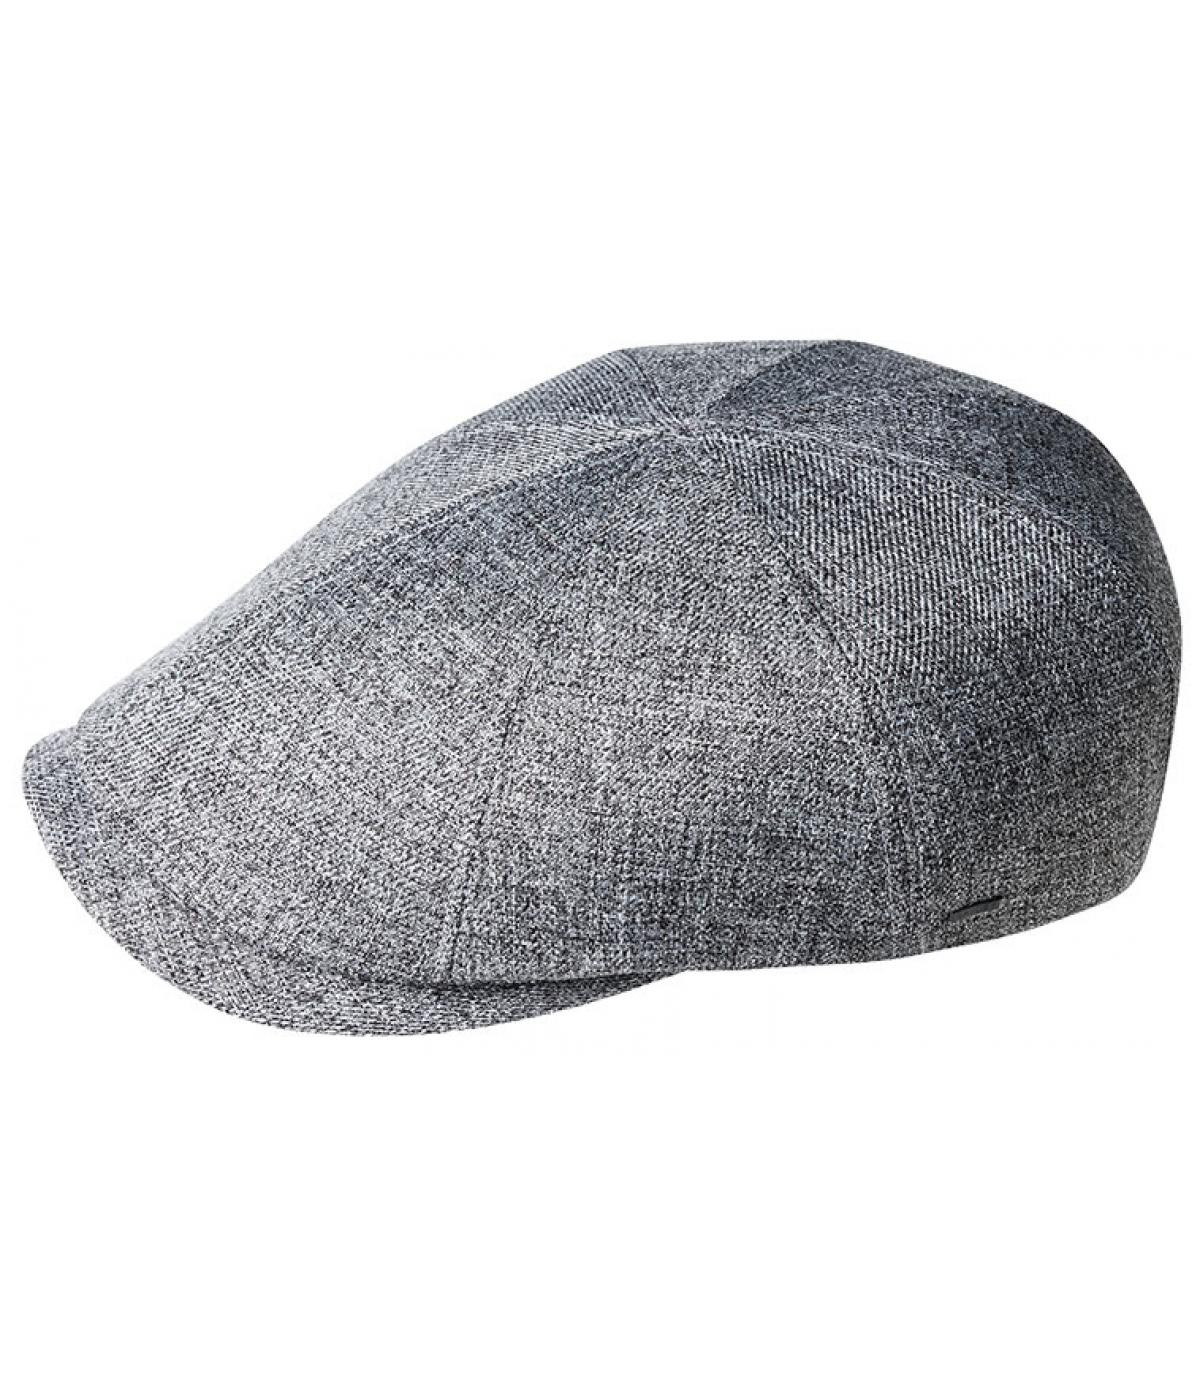 grey duckbill cap Bailey